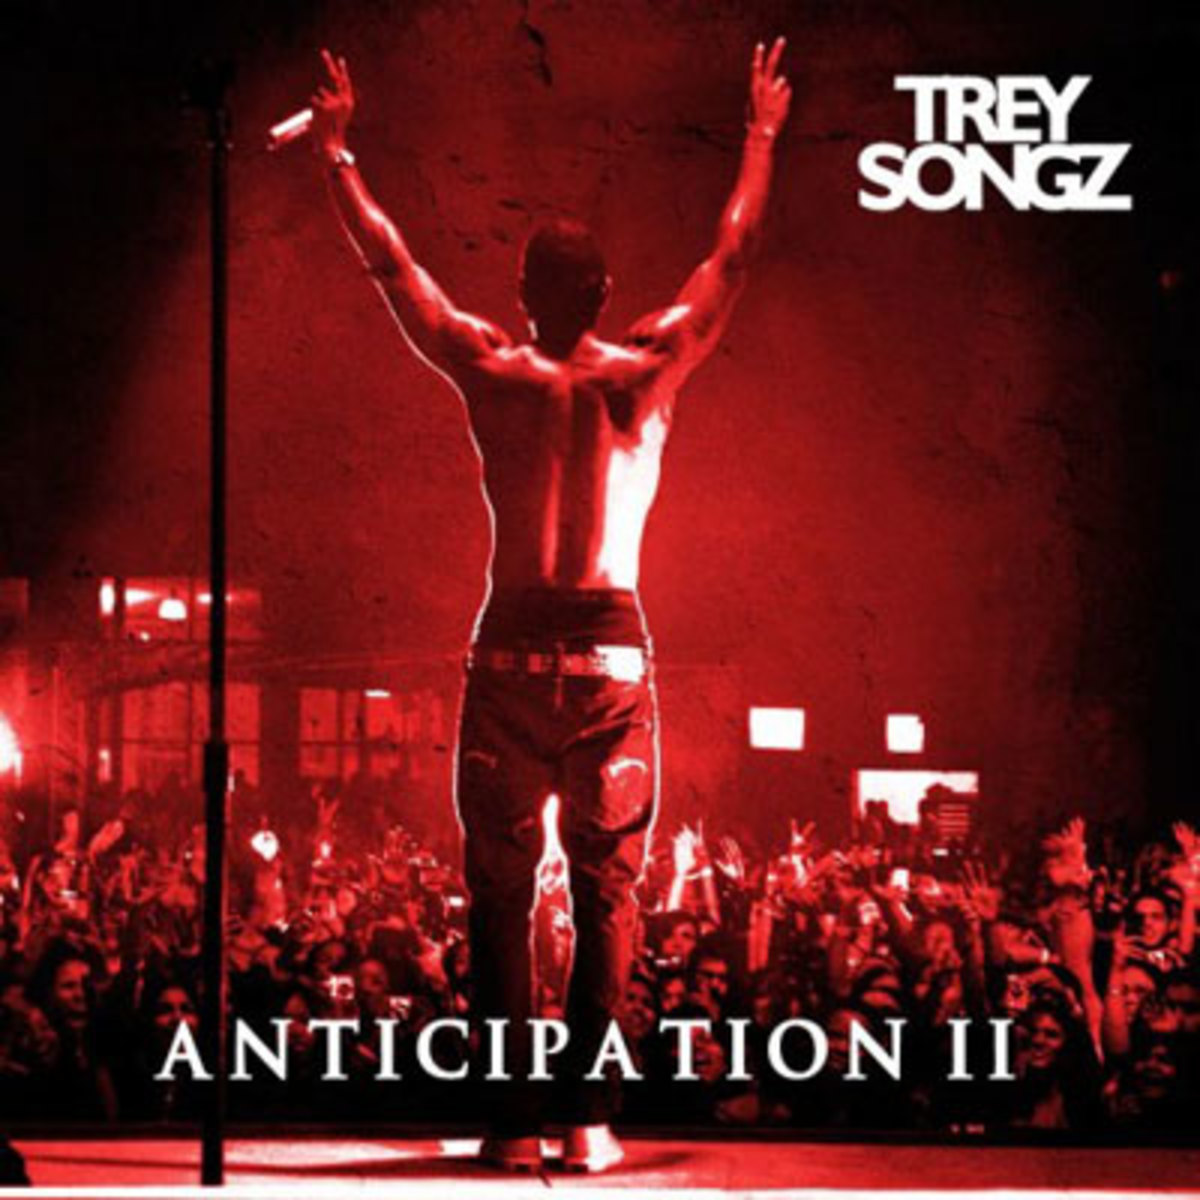 treysongz-anticipation2.jpg